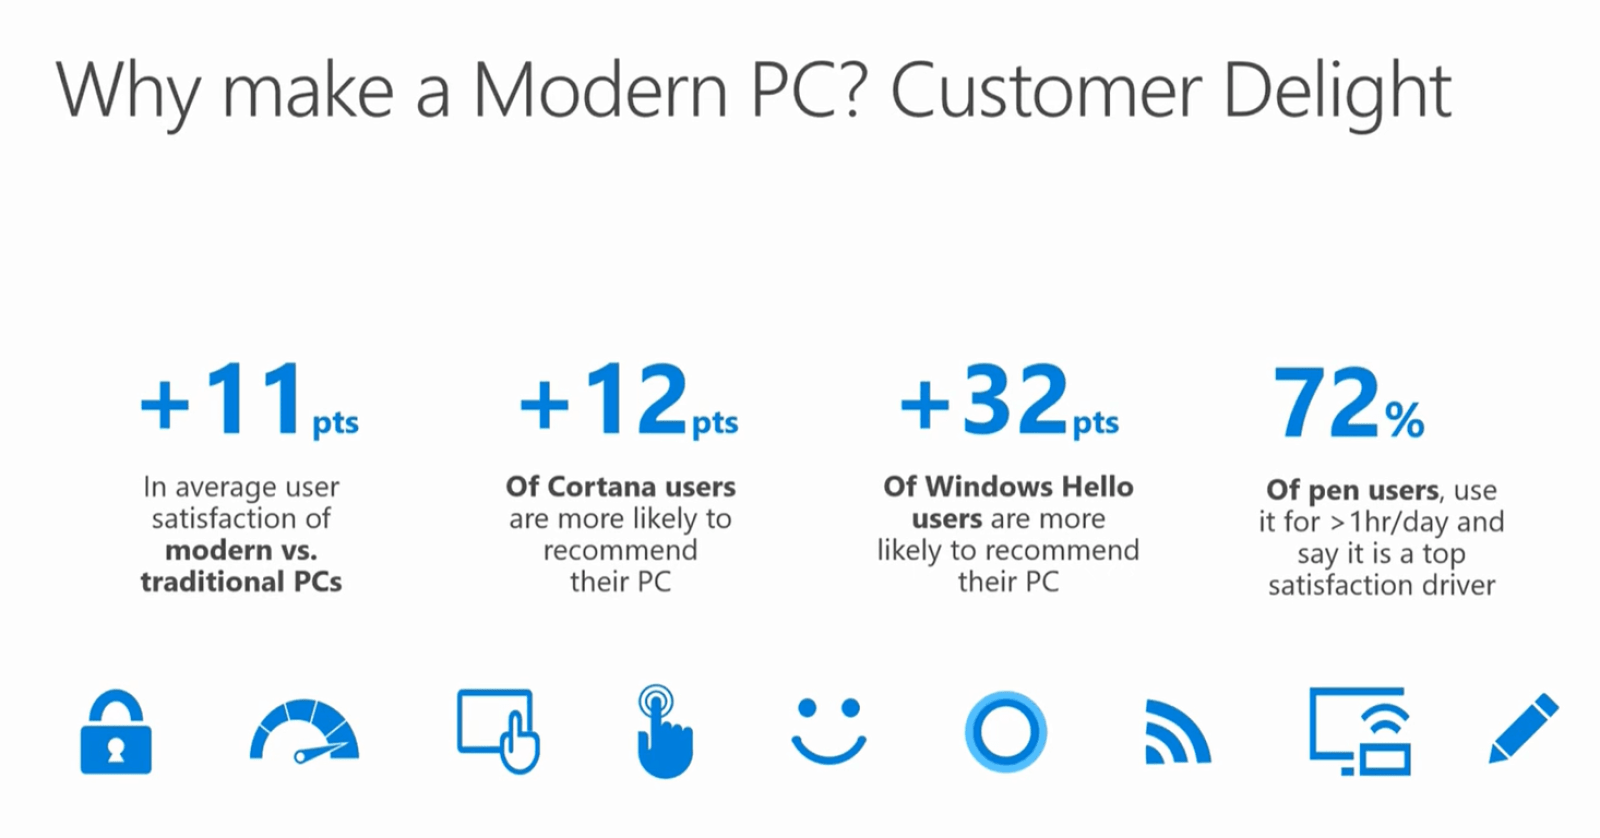 Stats about a modern PC